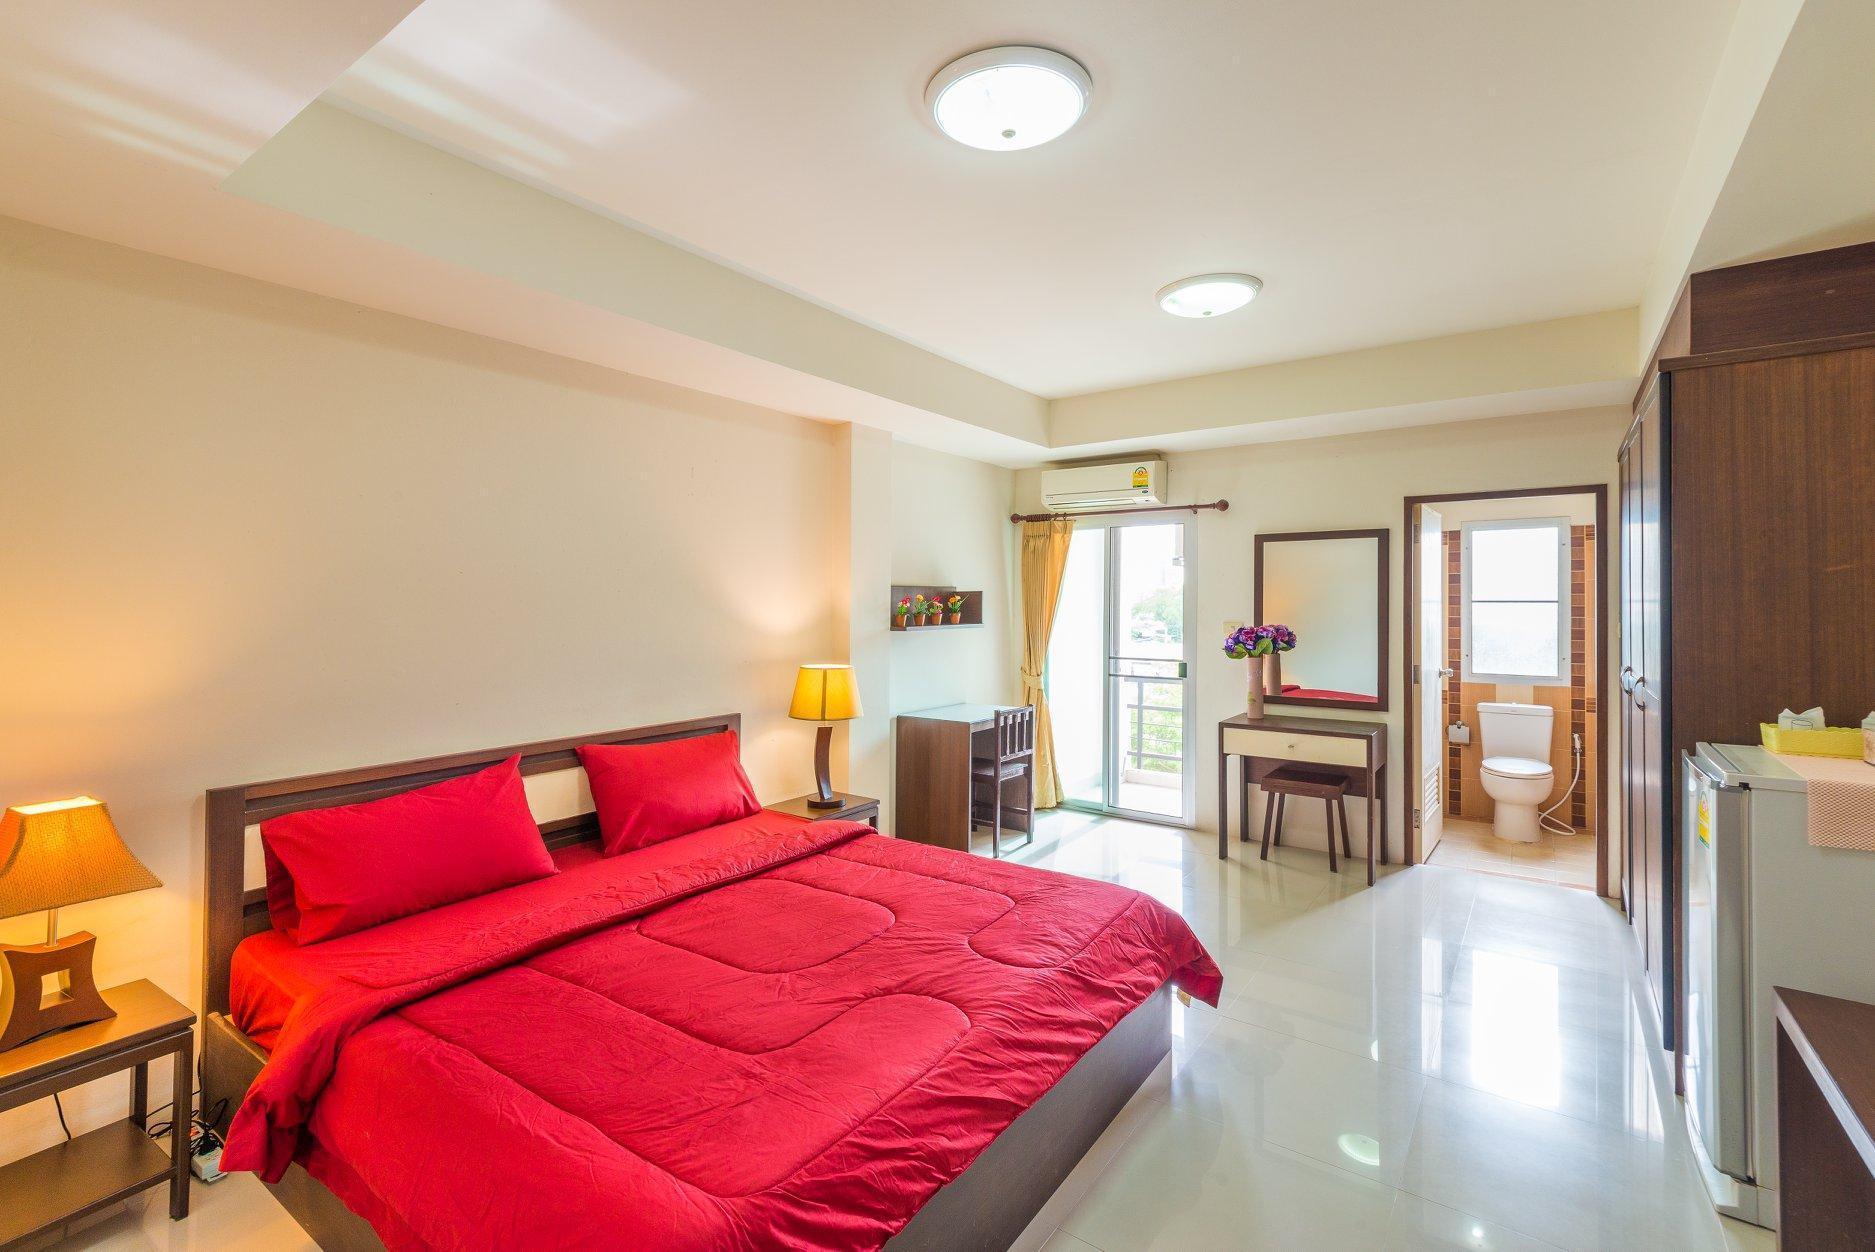 Tawana Residence Pattaya #14 สตูดิโอ อพาร์ตเมนต์ 1 ห้องน้ำส่วนตัว ขนาด 30 ตร.ม. – พัทยากลาง